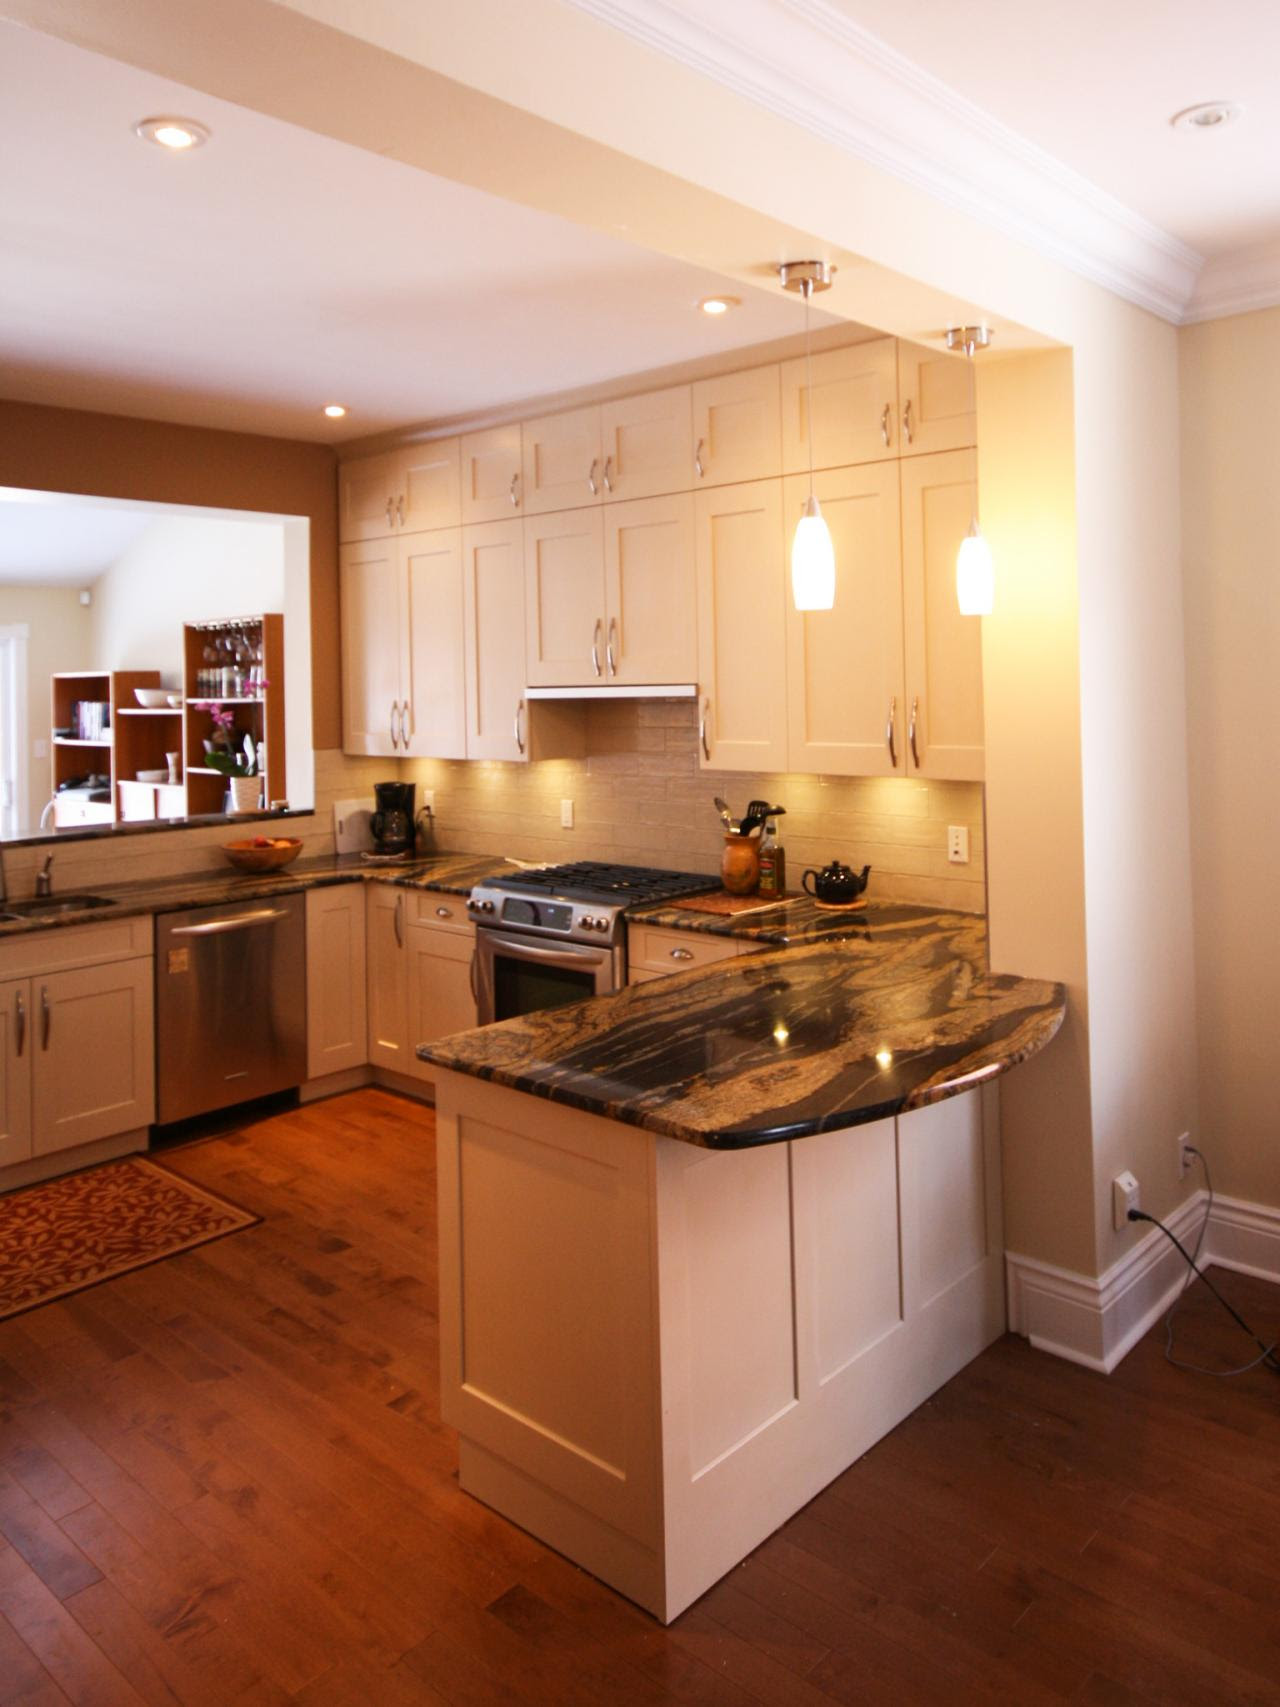 U-Shaped Kitchen Design Ideas: Pictures